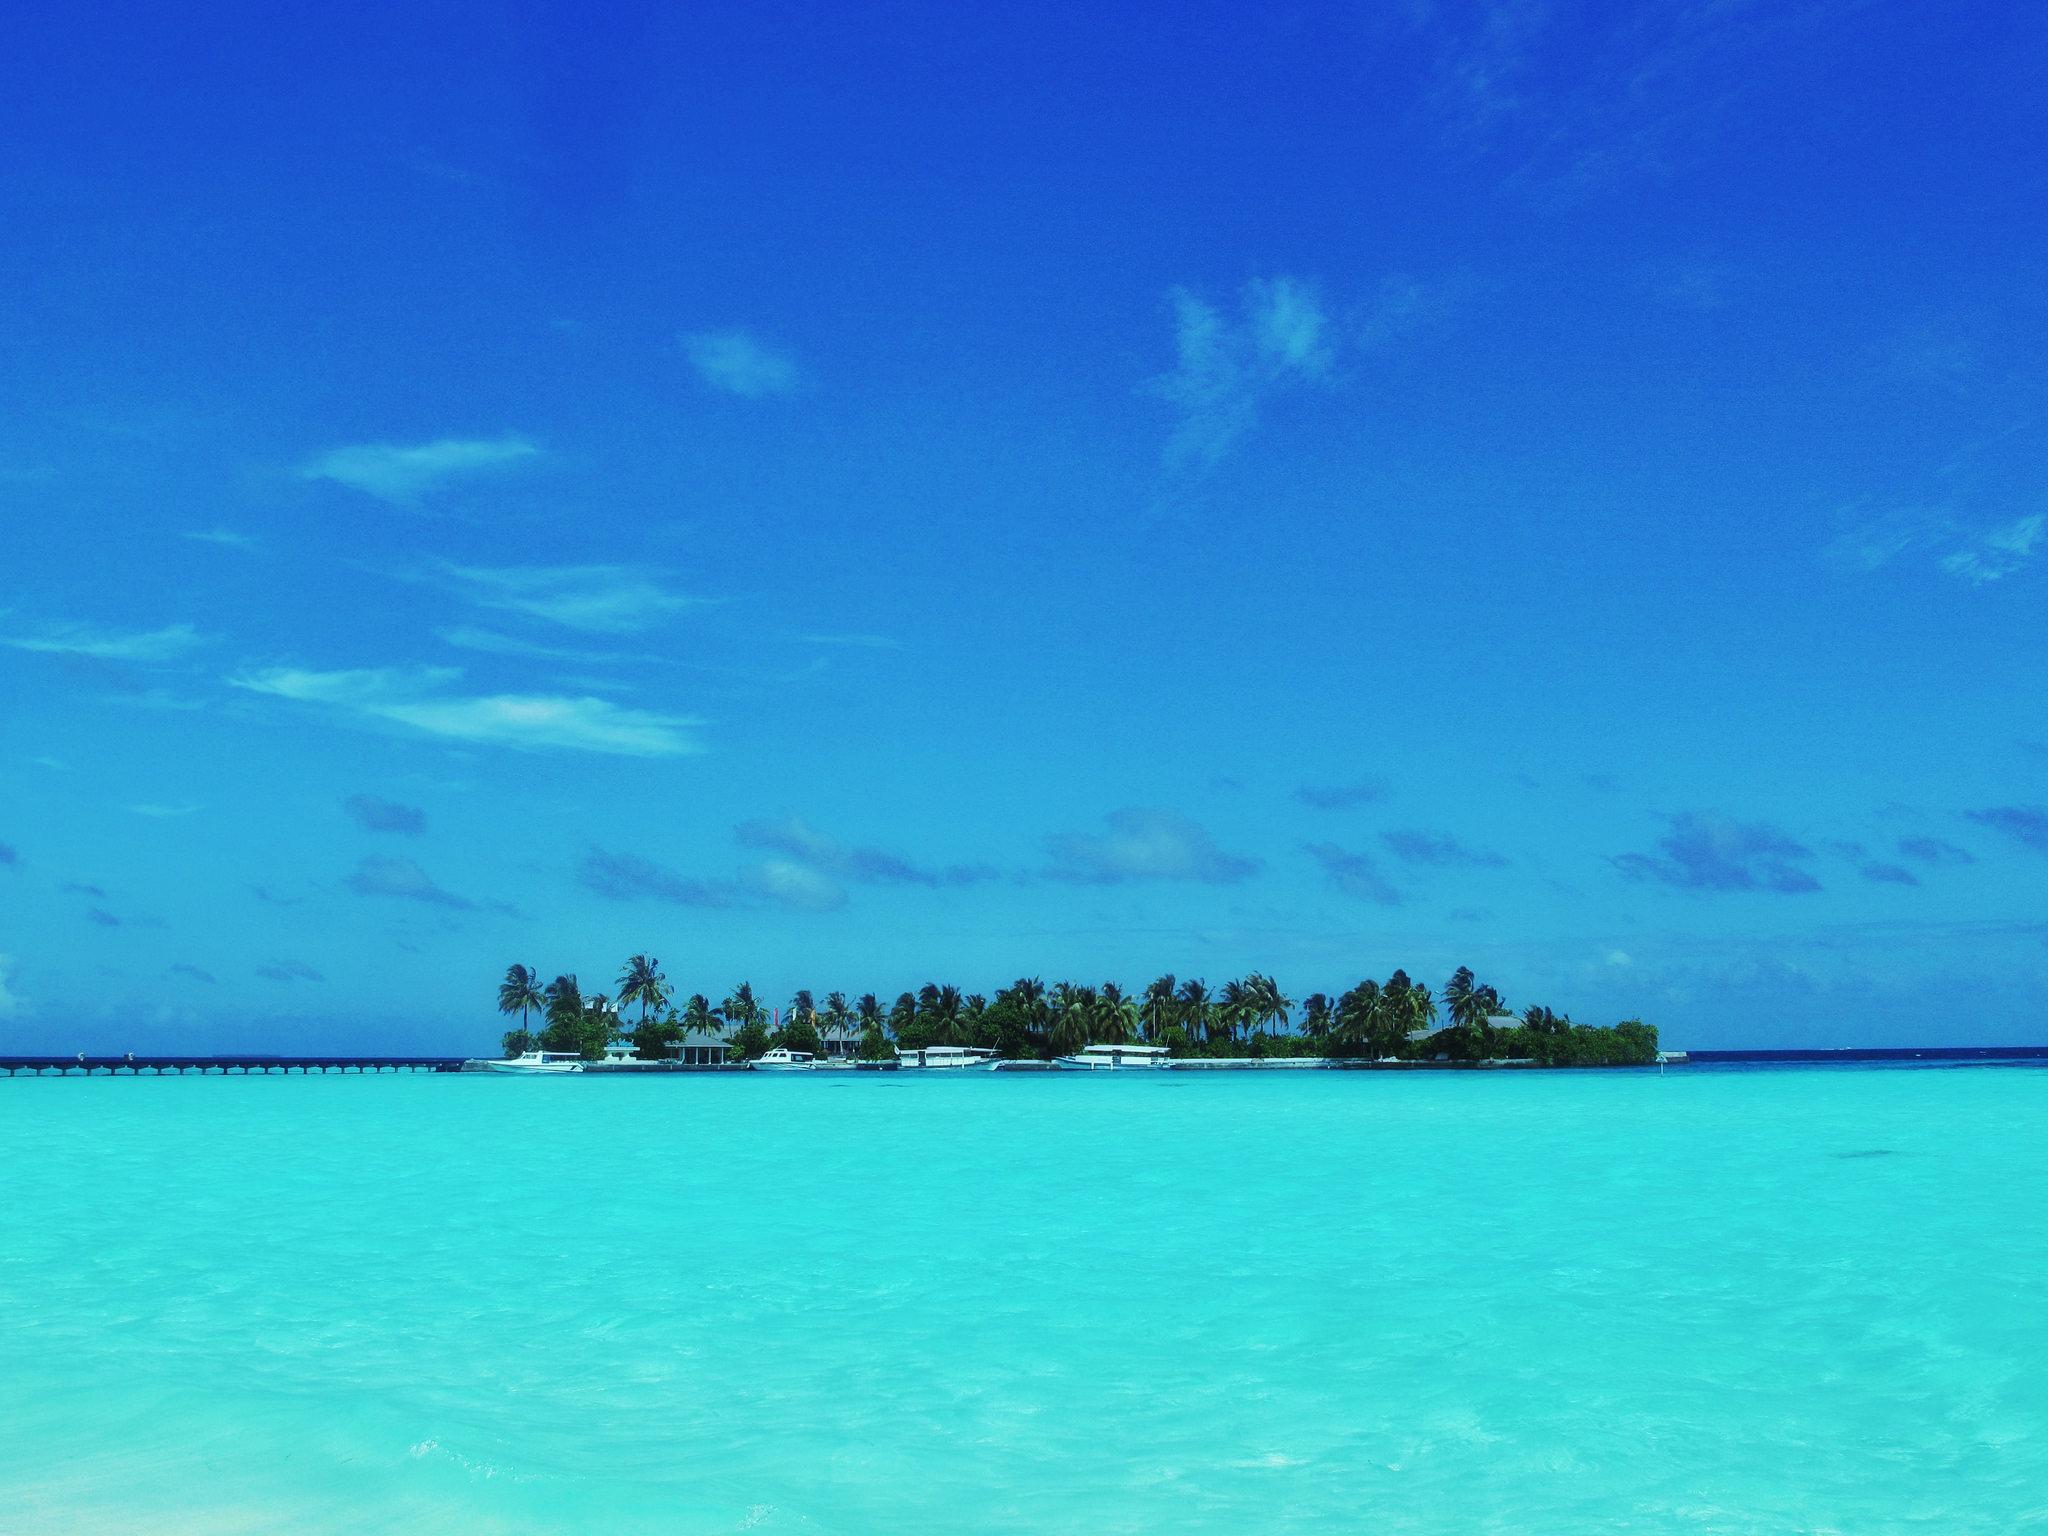 Malediven Wetter